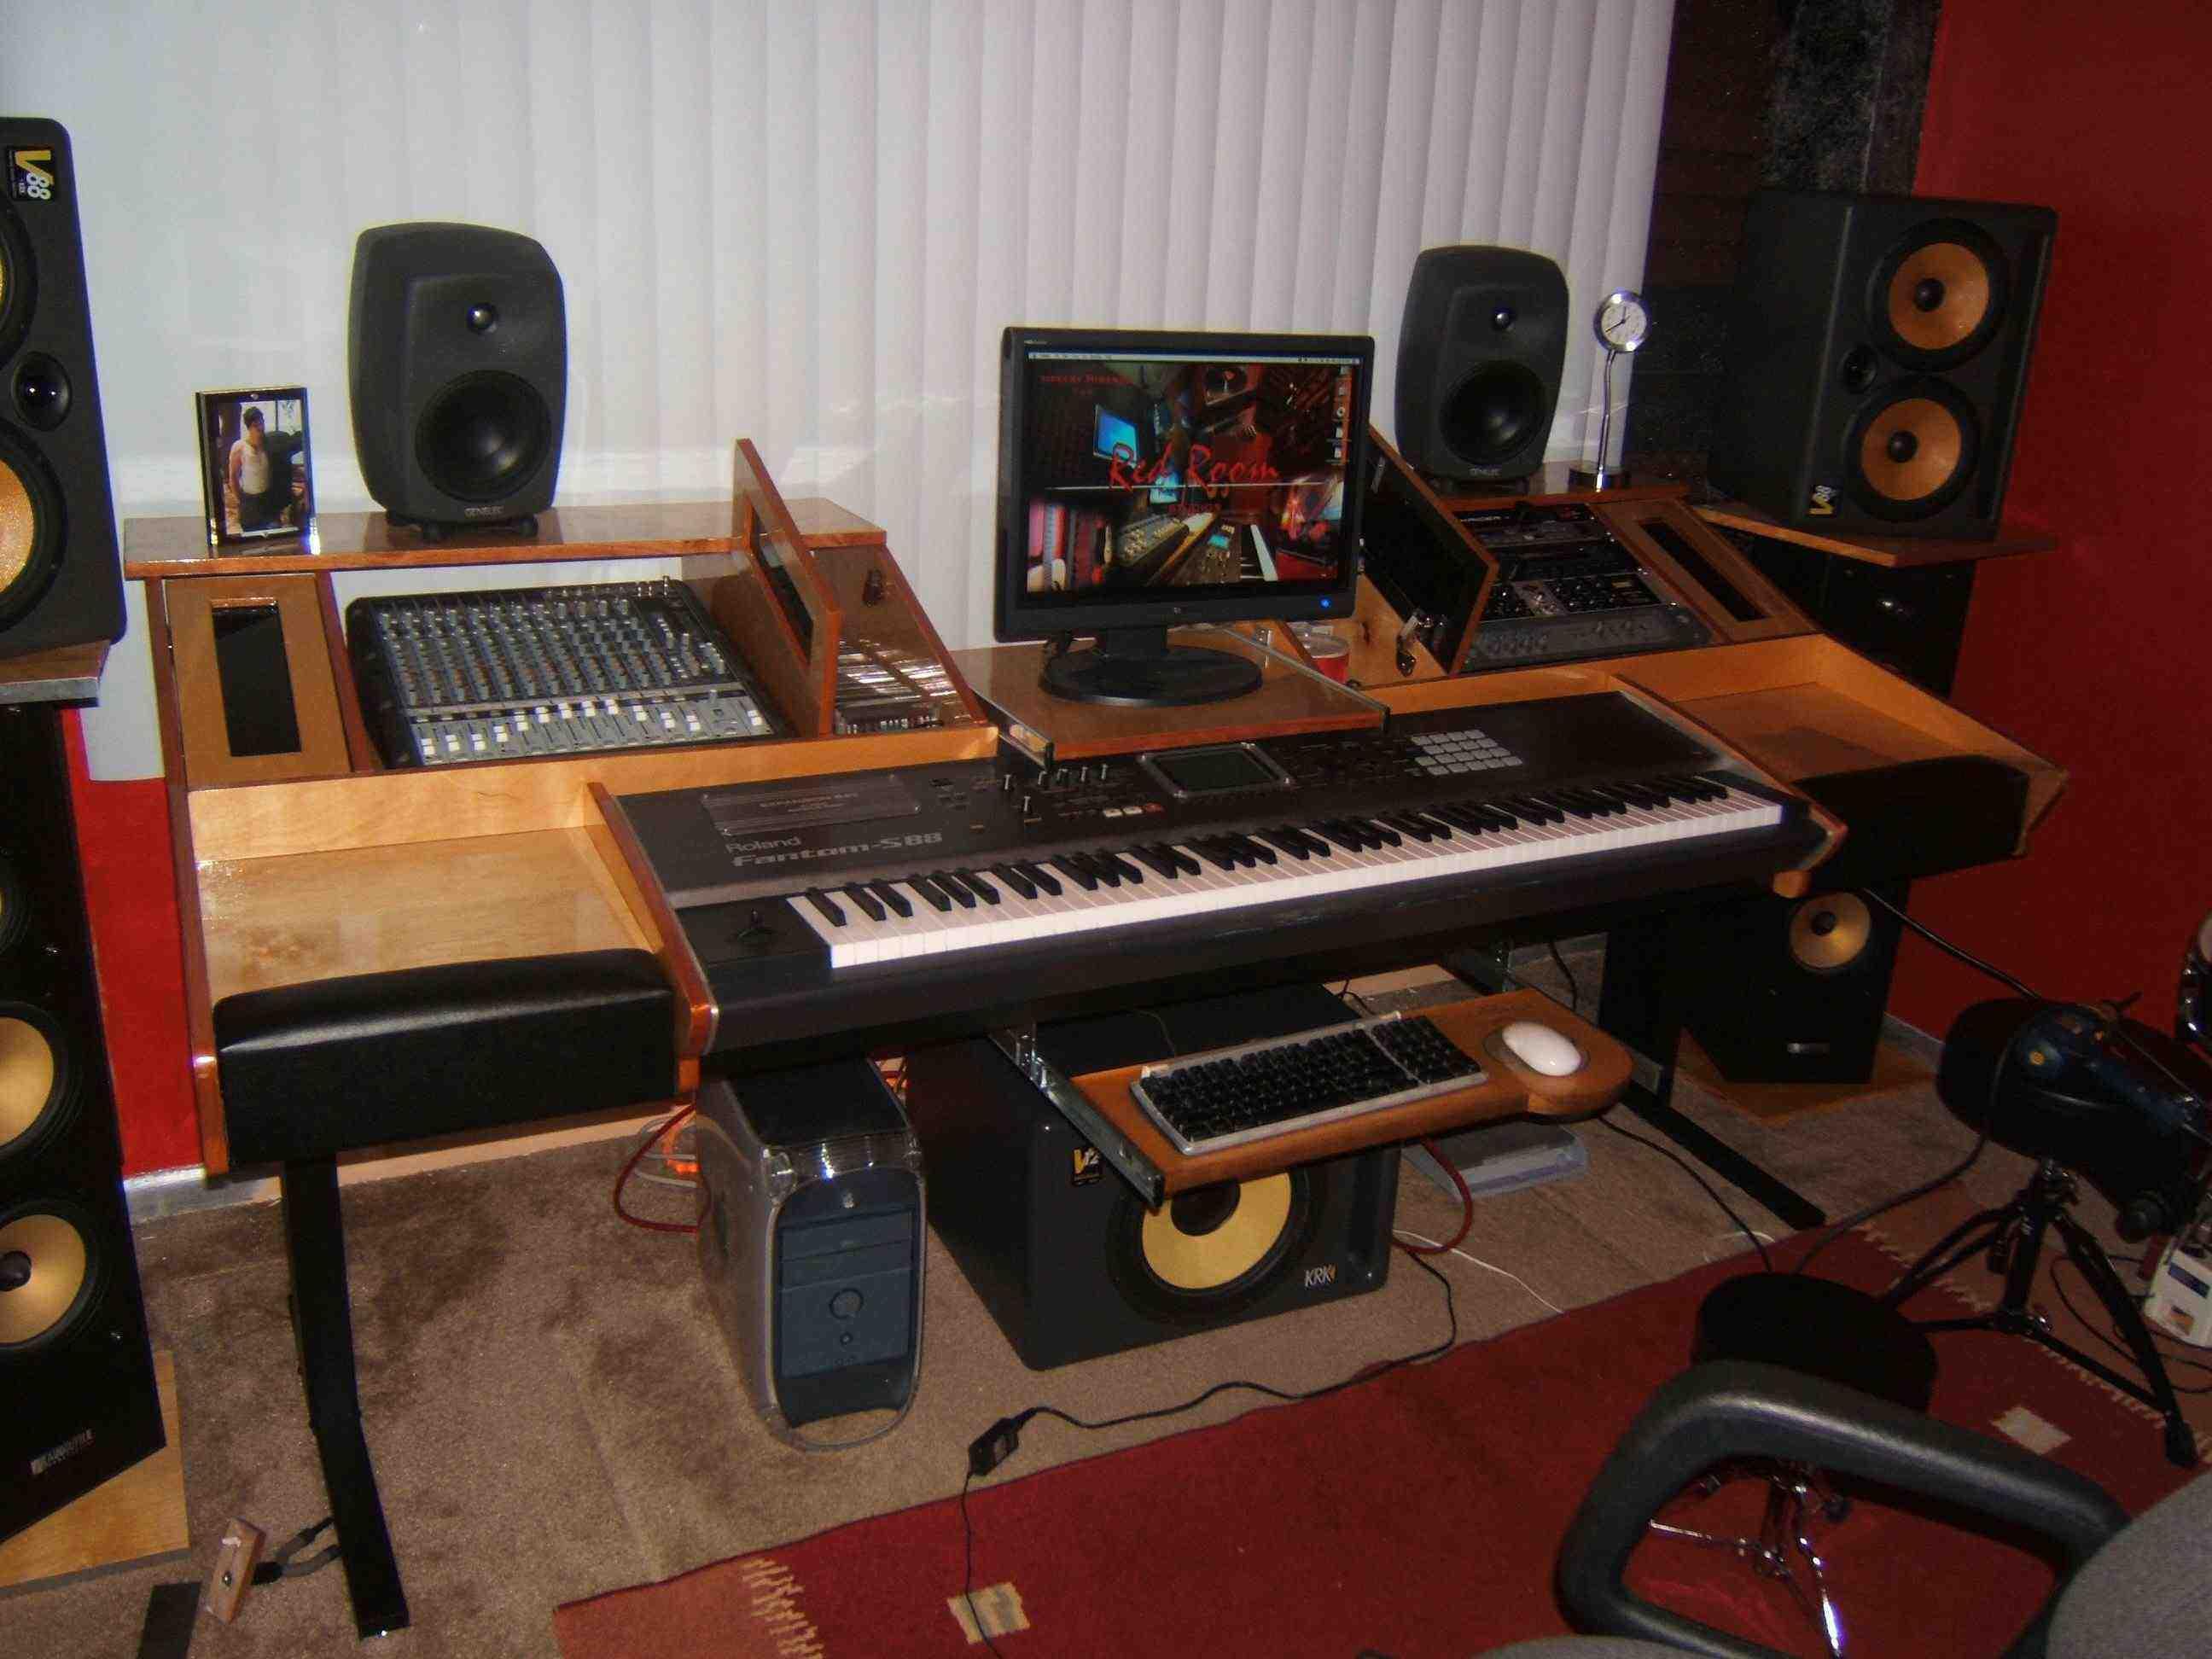 furniture for a studio like desks need help gearslutz pro audio community. Black Bedroom Furniture Sets. Home Design Ideas